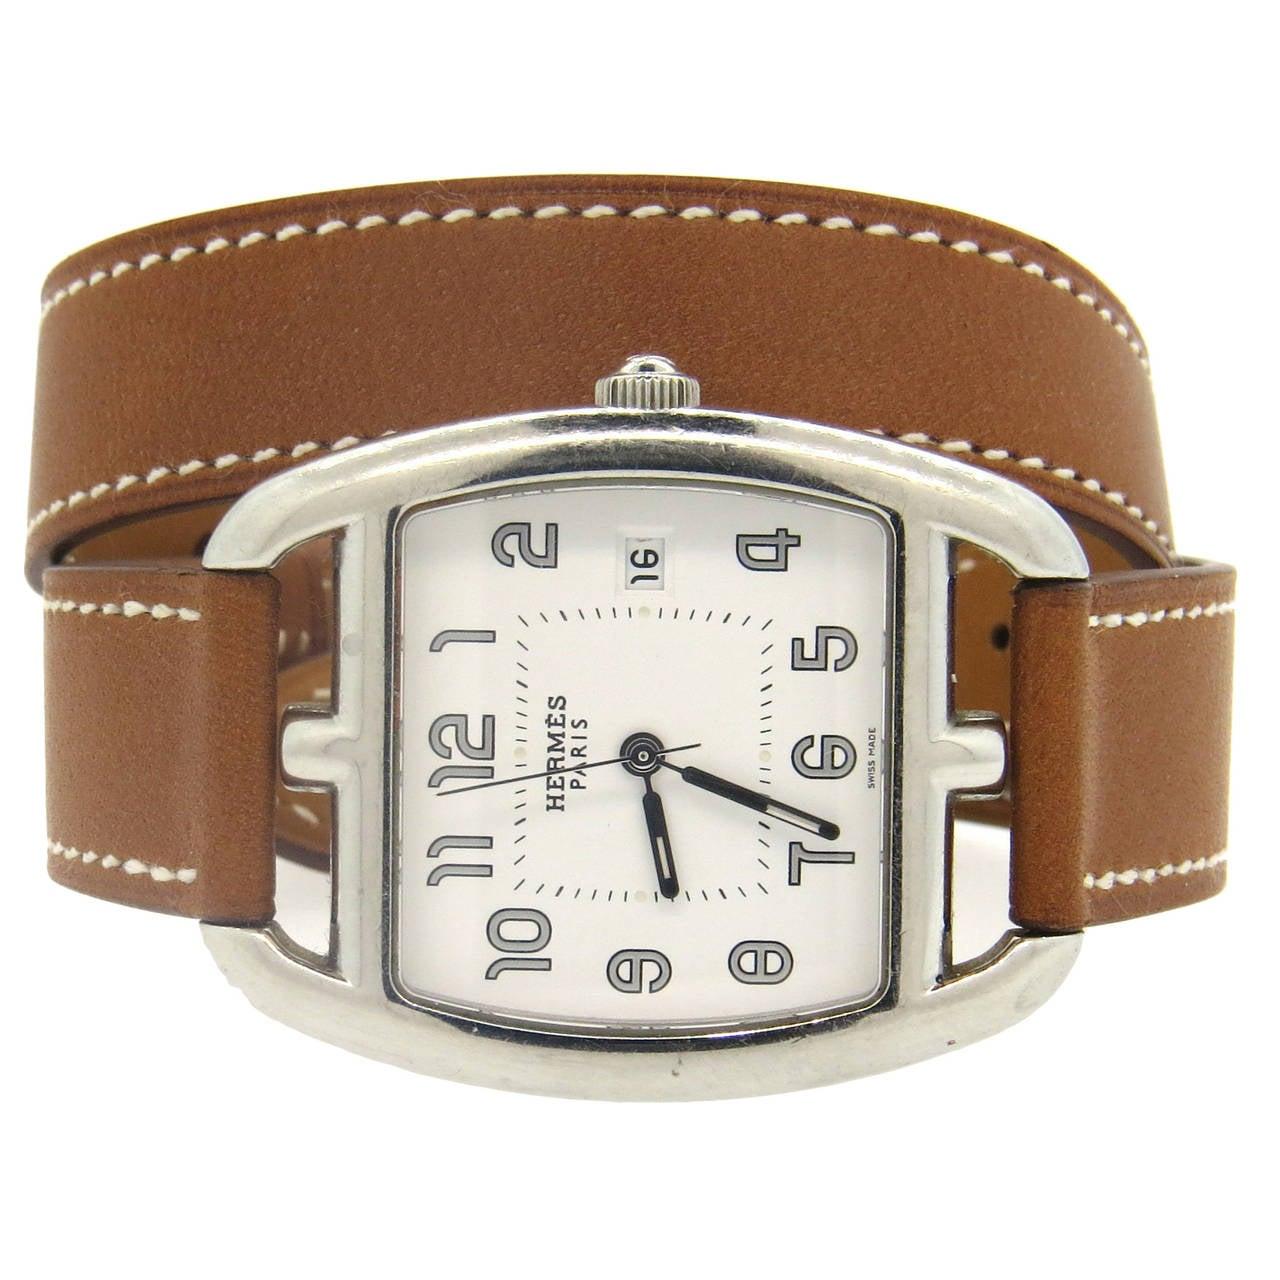 Hermes Stainless Steel Cape Cod Tonneau Wrap Bracelet Watch Ref Ct1 710 For